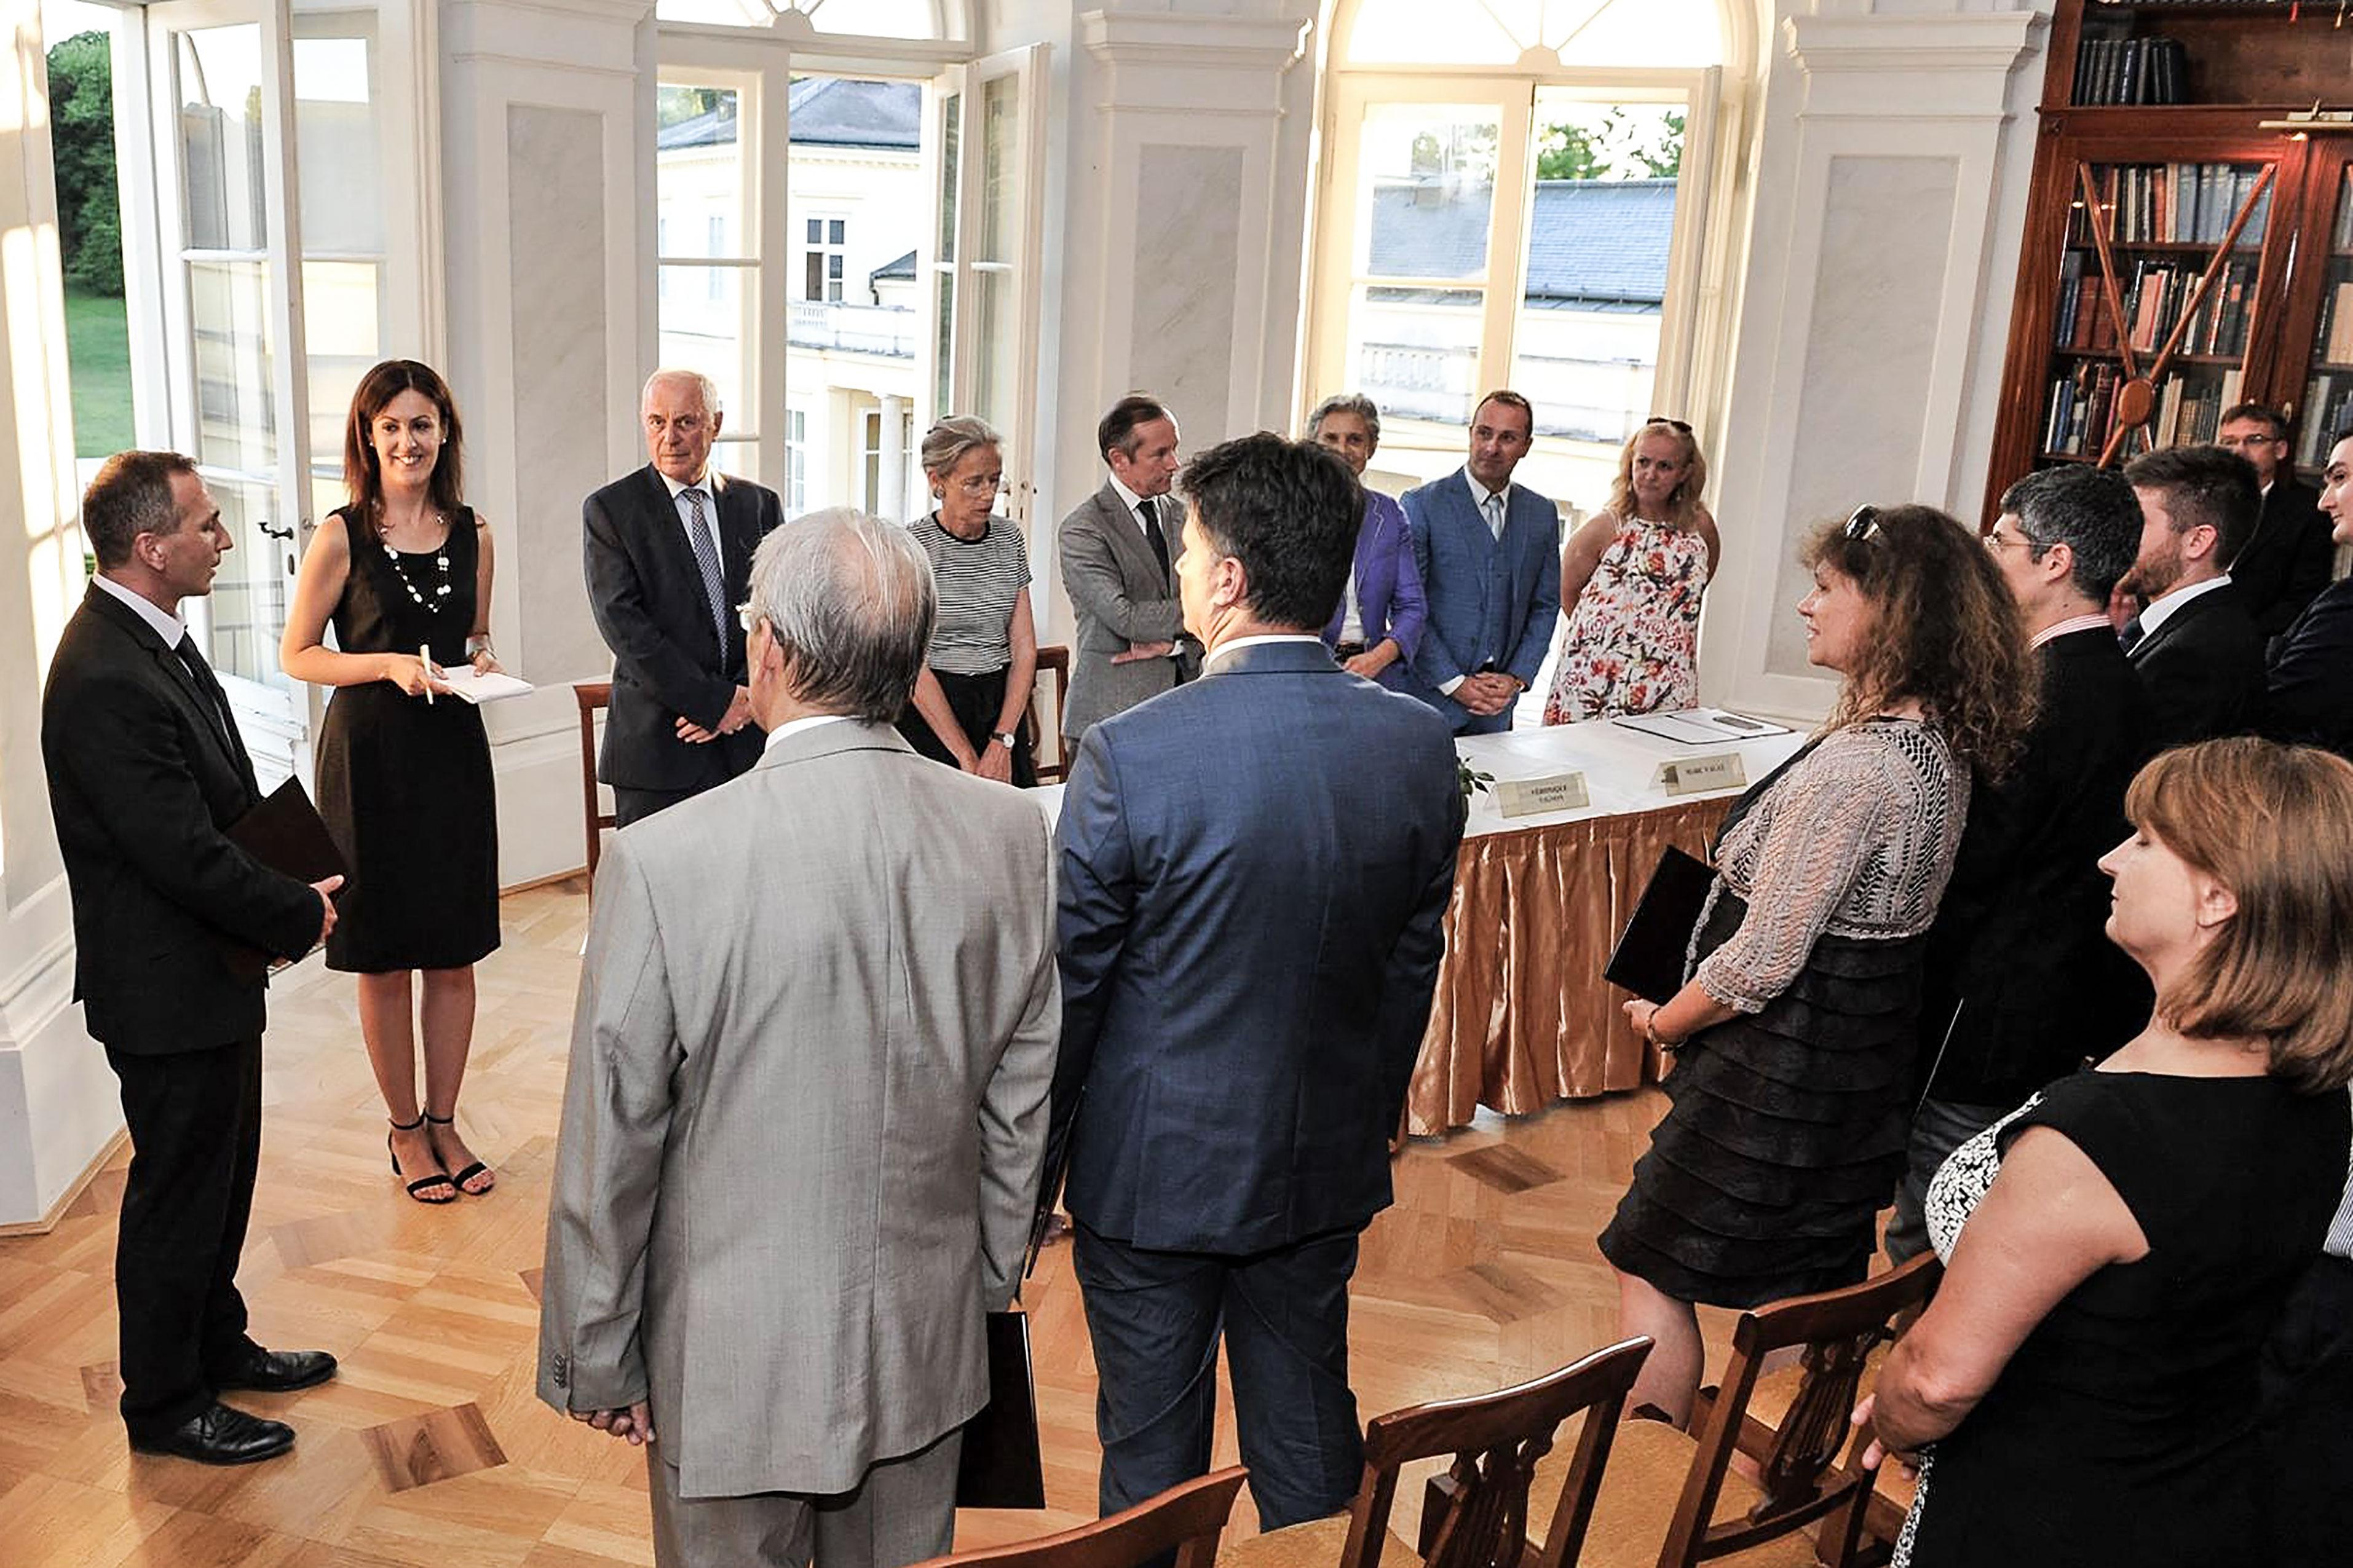 h-vadasz-linda-2018-francia-mester-mba-mae-kepzes-diplomaatado-unnepsege-2017.jpg